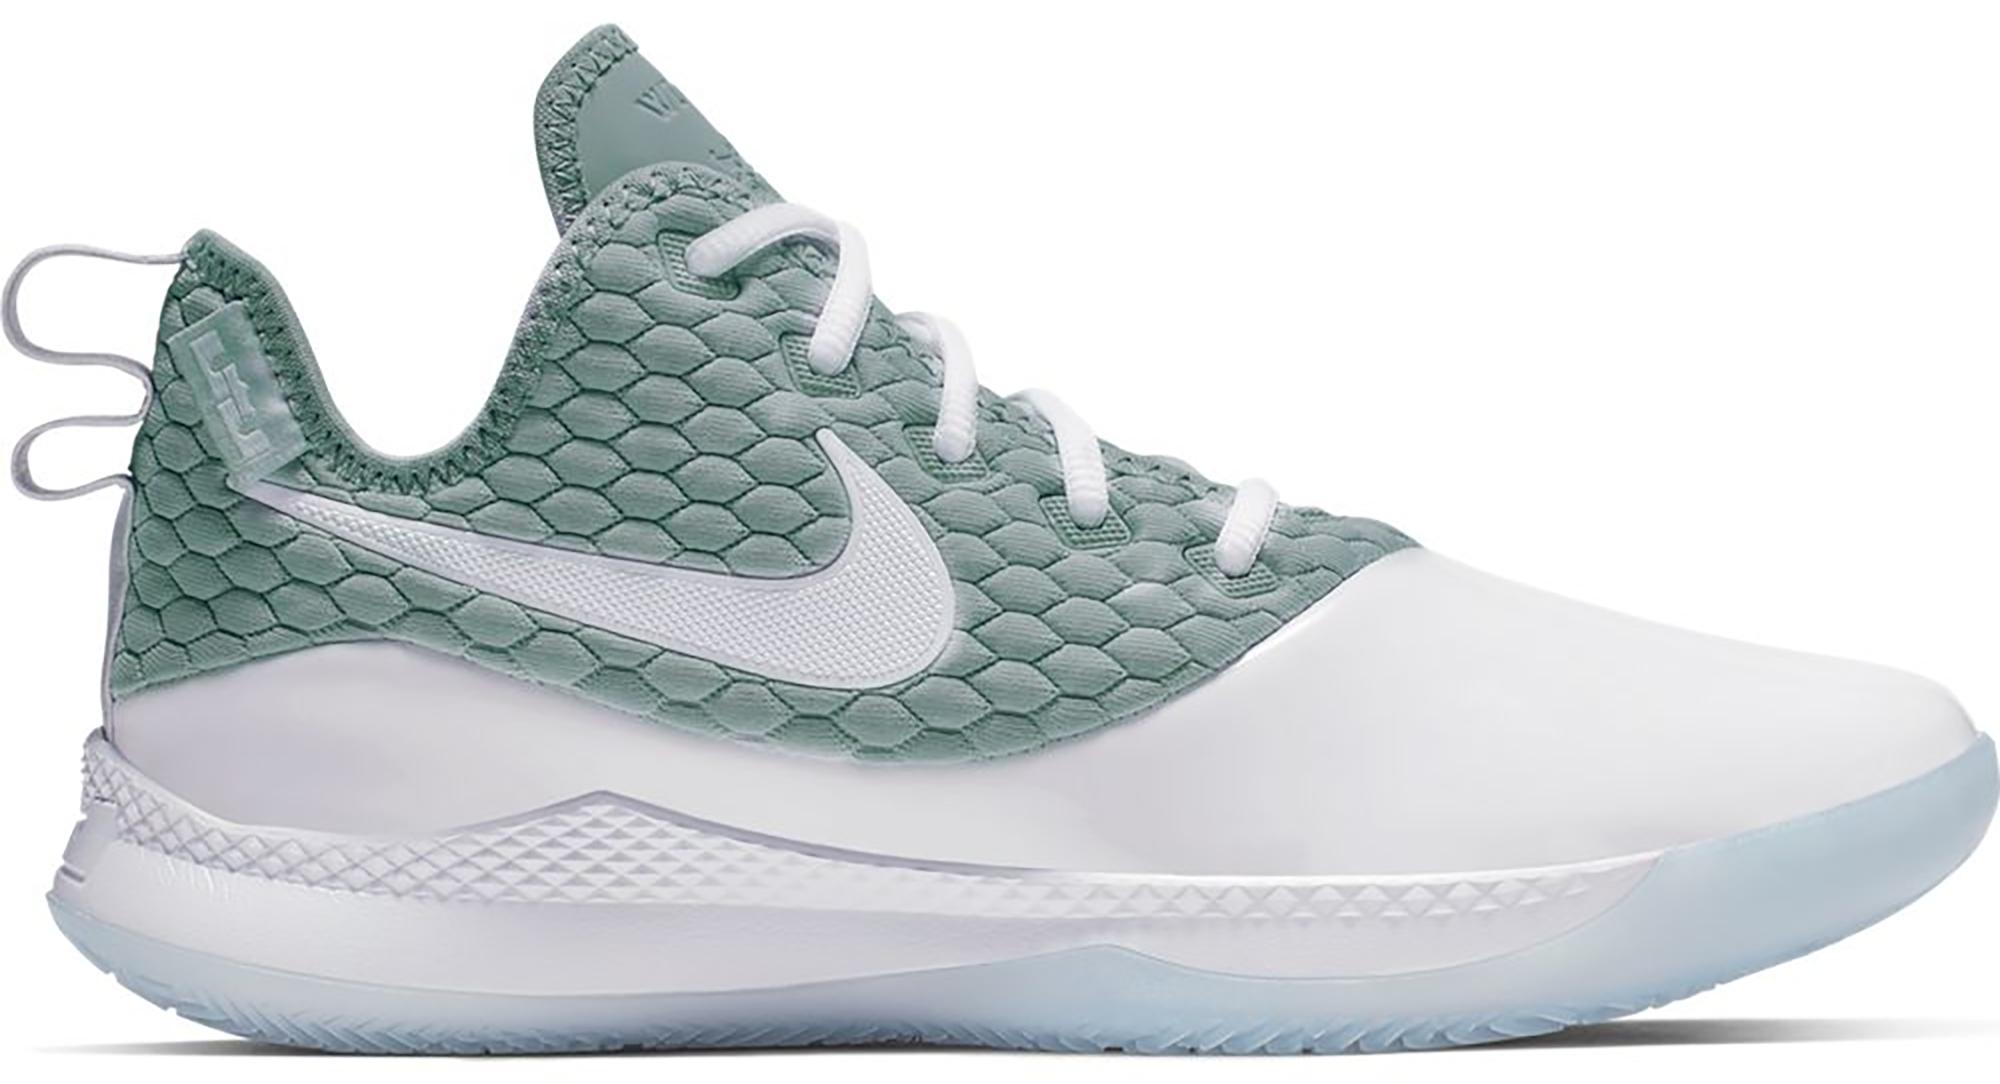 Nike LeBron Witness 3 Wolf Grey